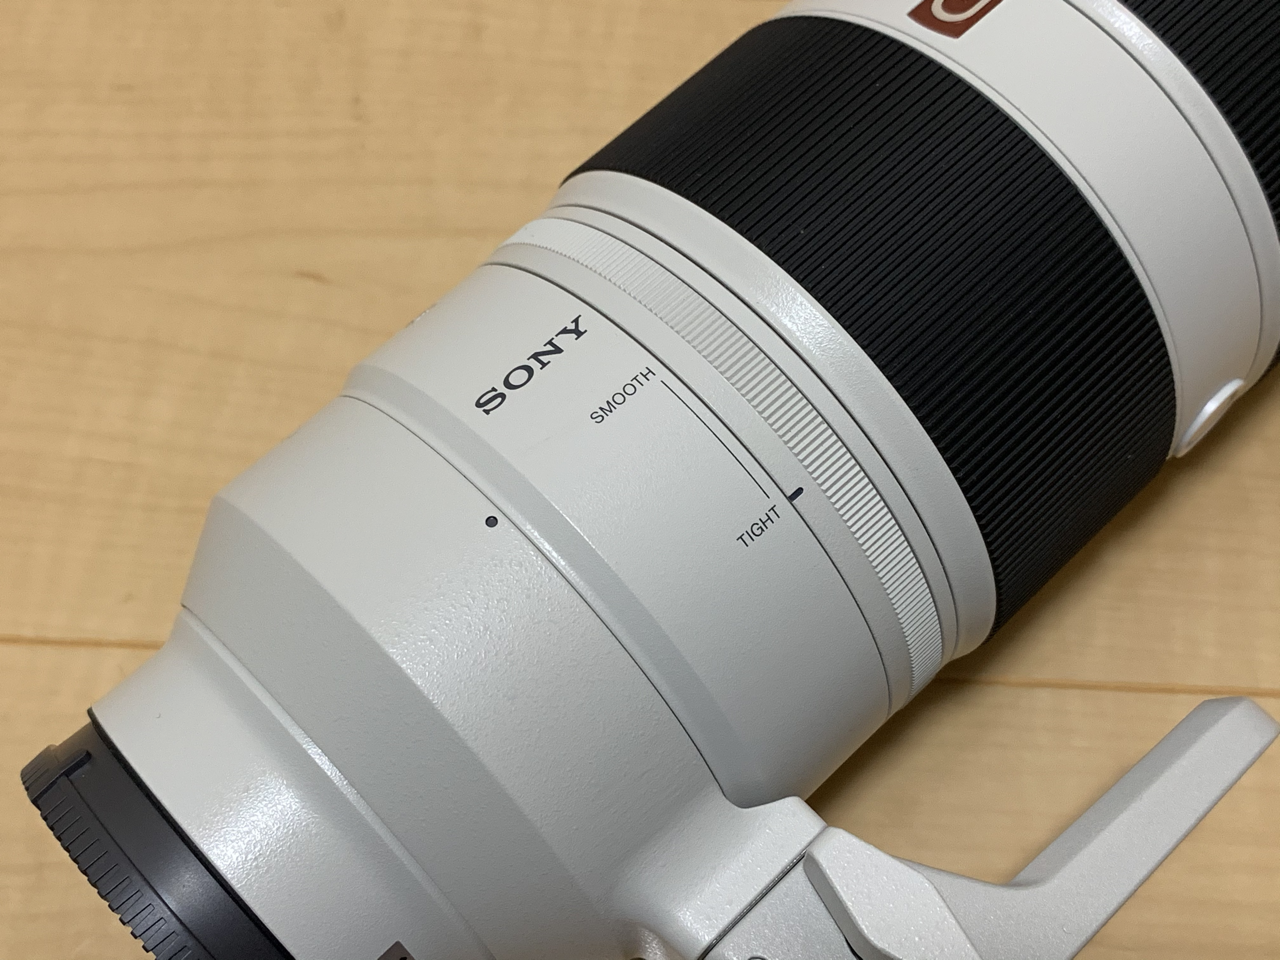 FE 100-400mm F4.5-5.6 GM OSS ズームリングの硬さを調節できる